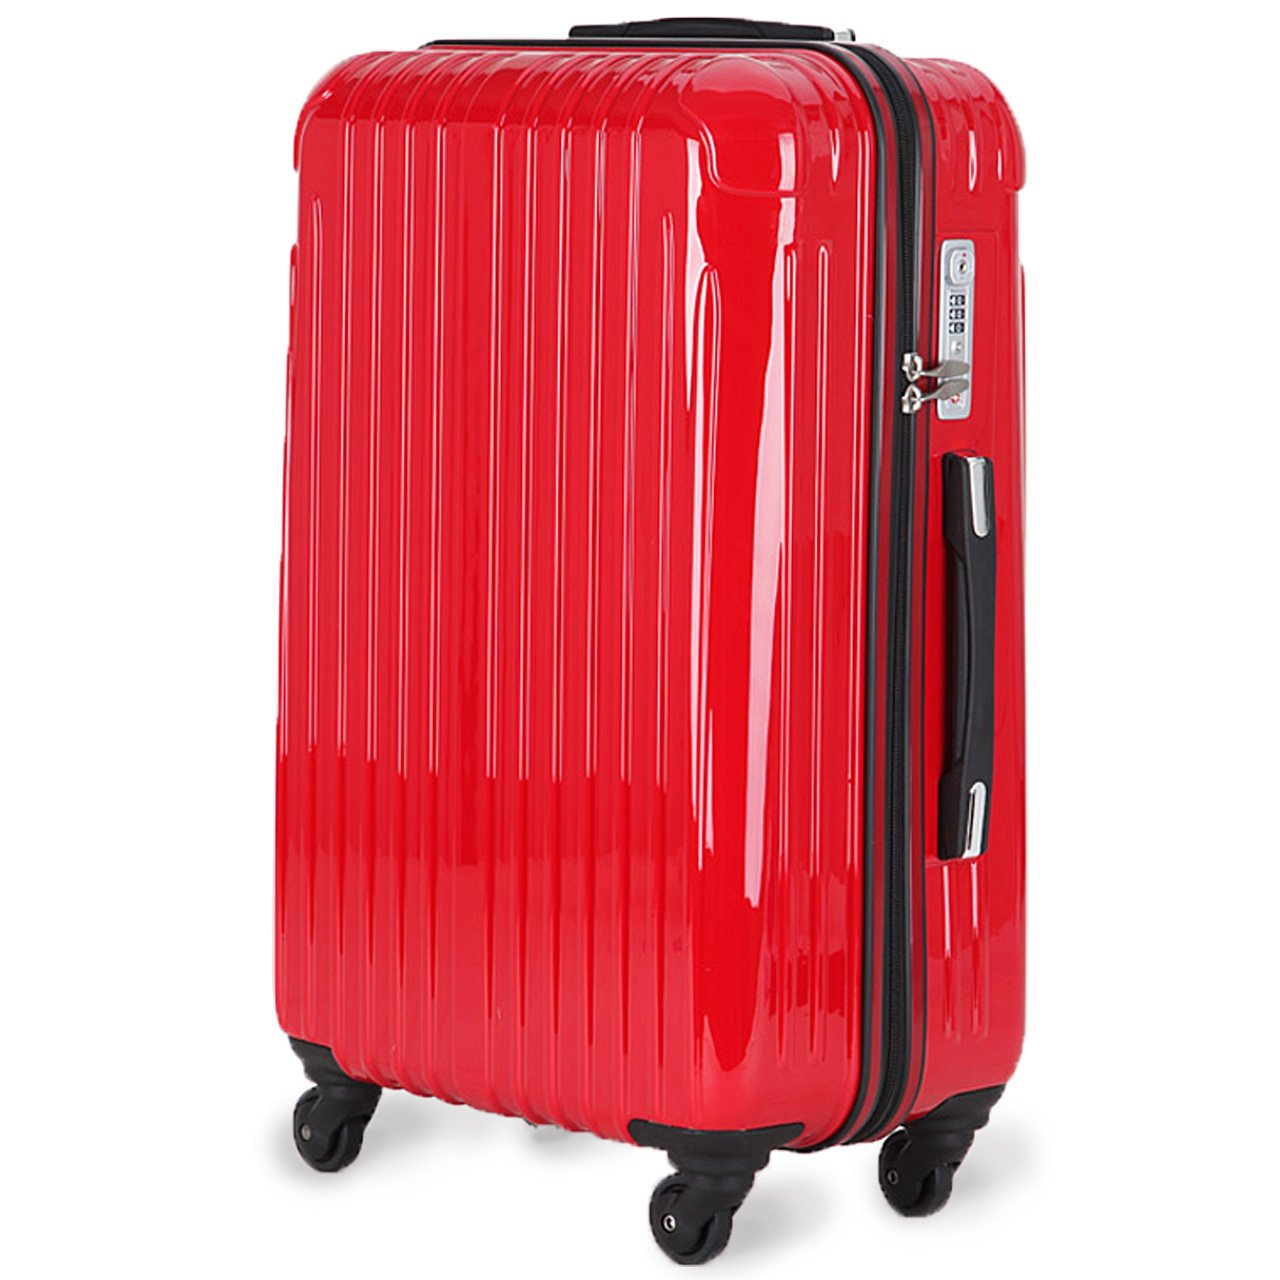 strike[ストライク]超軽量 2年保証 スーツケース TSAロック搭載 旅行バック トランクケース 旅行カバン B06Y2HKPMV 中型Mサイズ(4-7泊)|レッド レッド 中型Mサイズ(4-7泊)